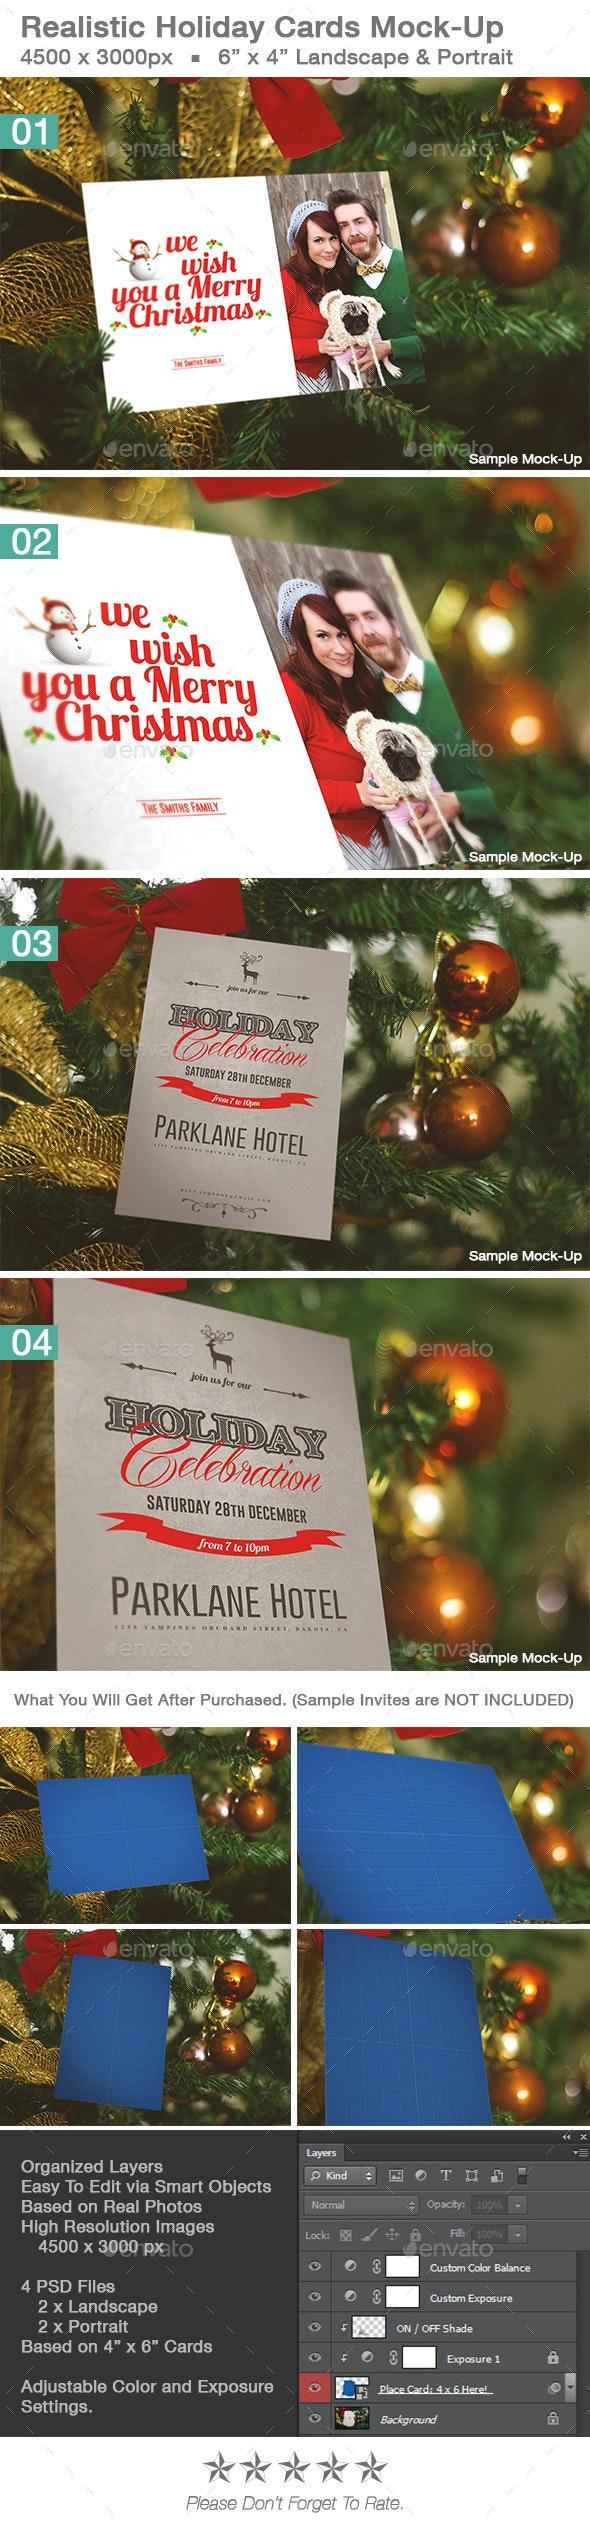 Realistic Holiday Card Mock-Up Vol 1 - Print Product Mock-Ups